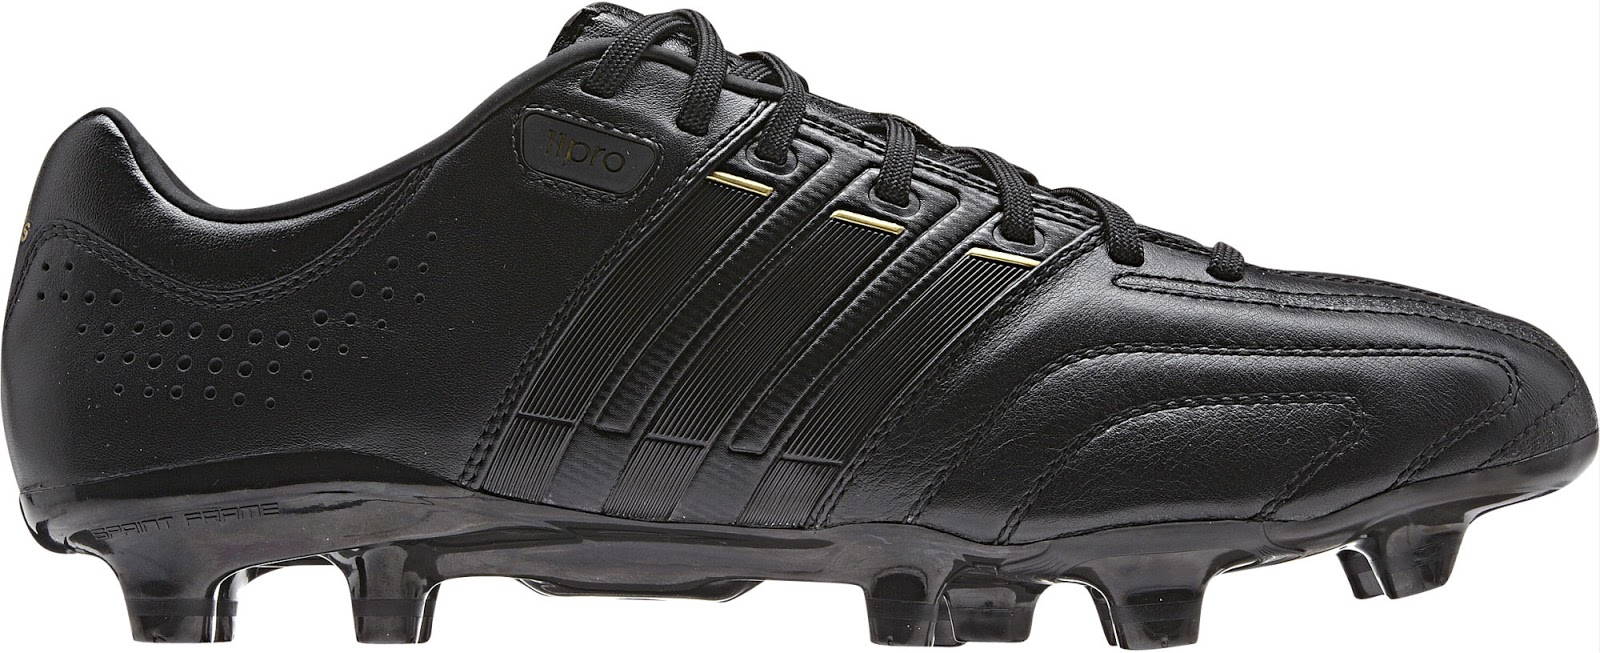 b6a6d591e Adidas Adipure Blackout Boot Released - Sports kicks